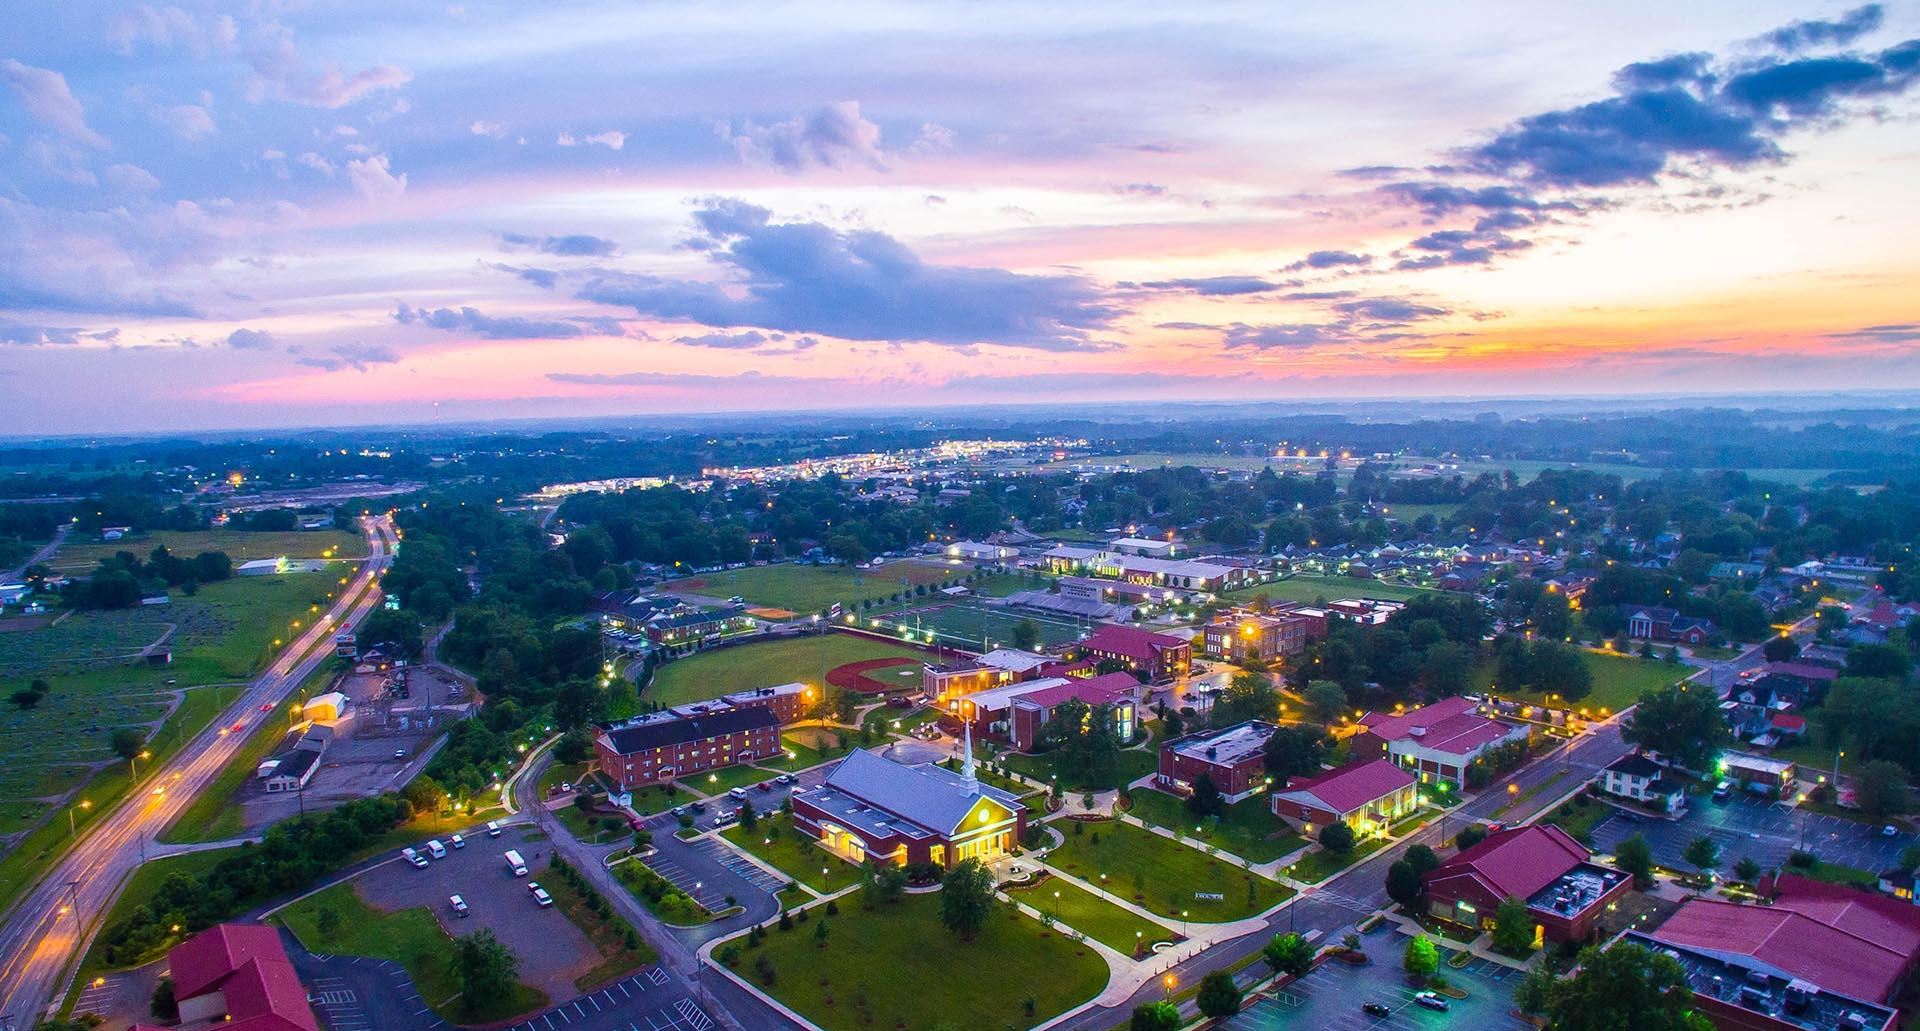 Harrodsburg Conover Education Center image 3